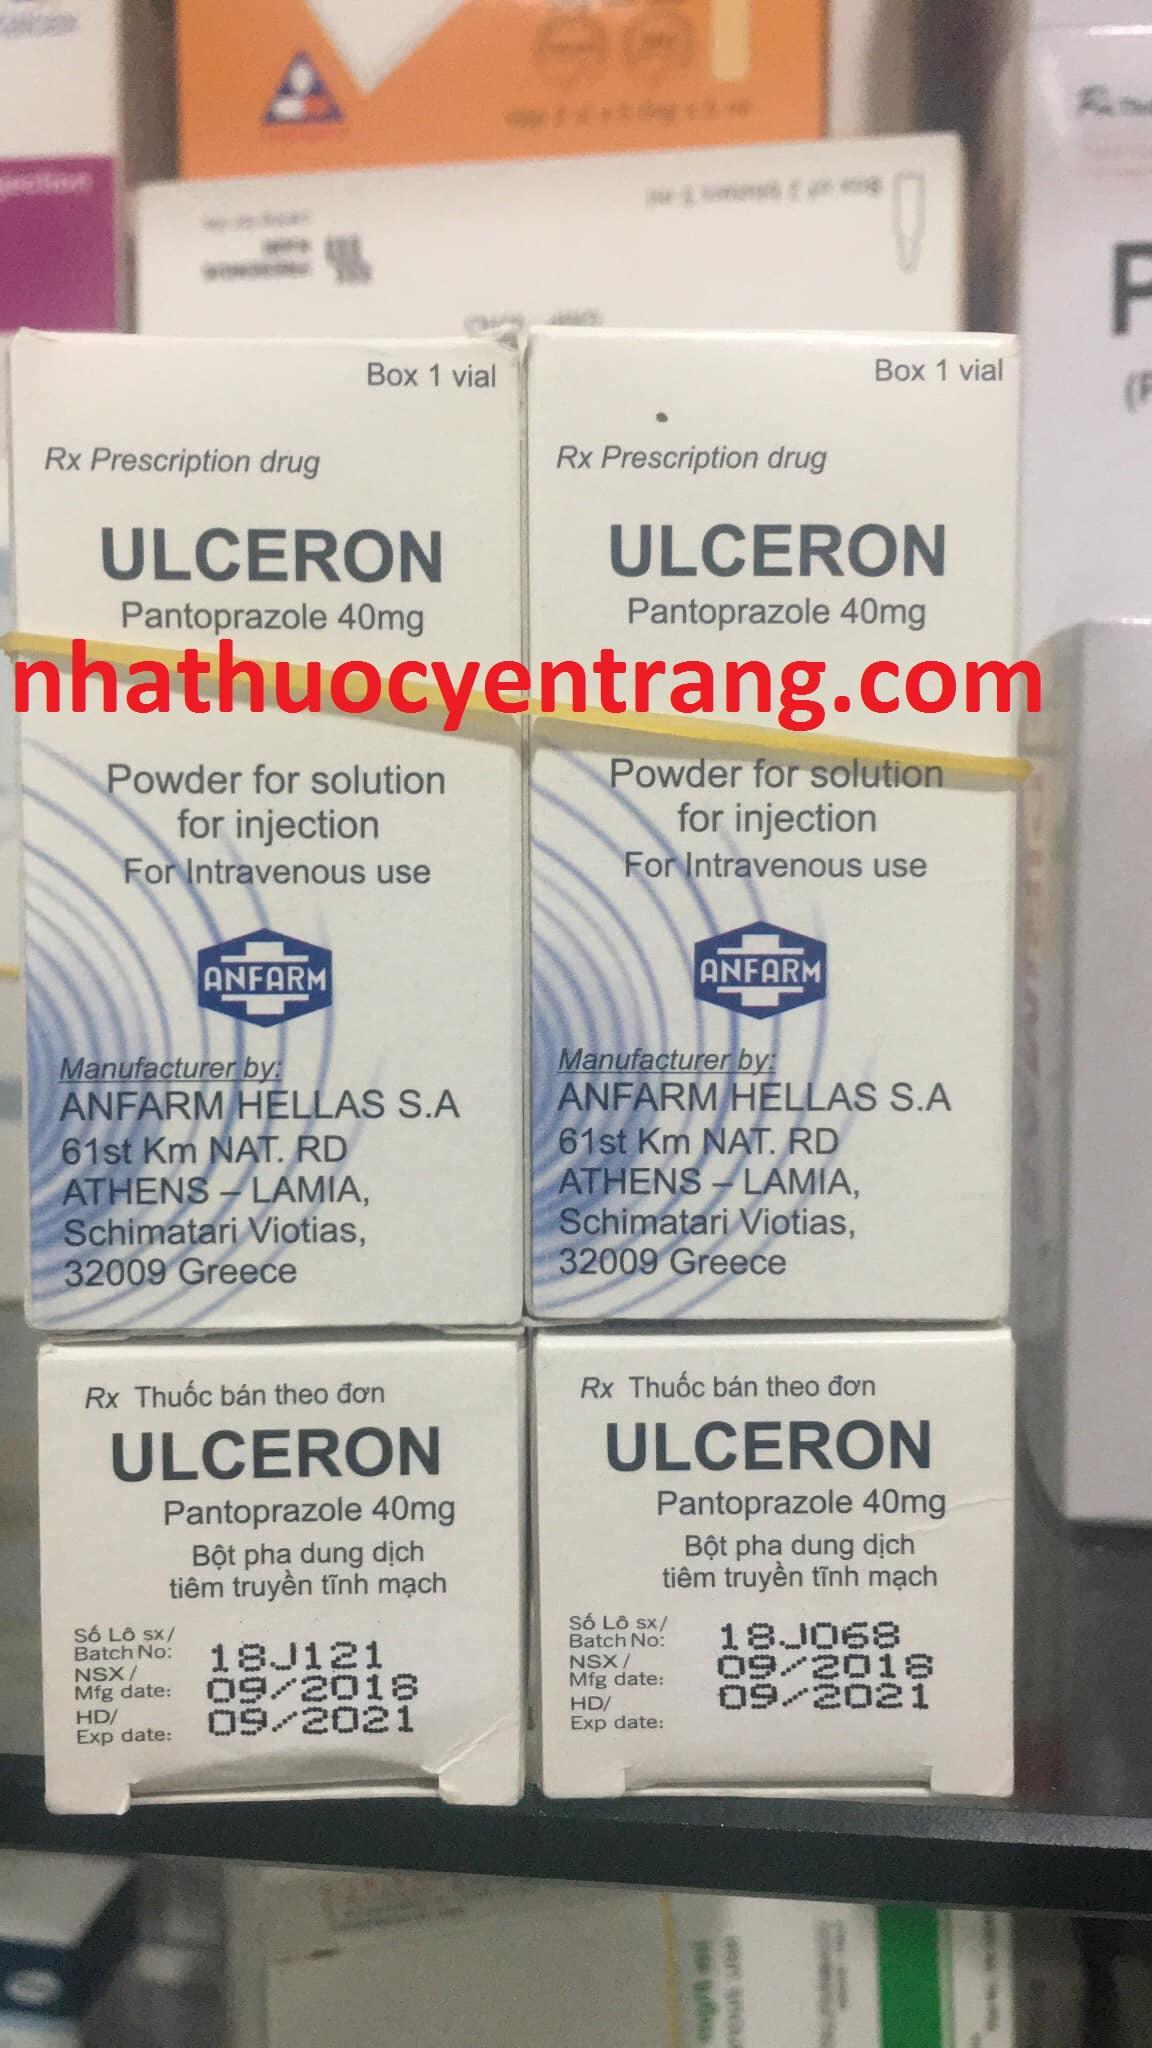 Ulceron 40mg